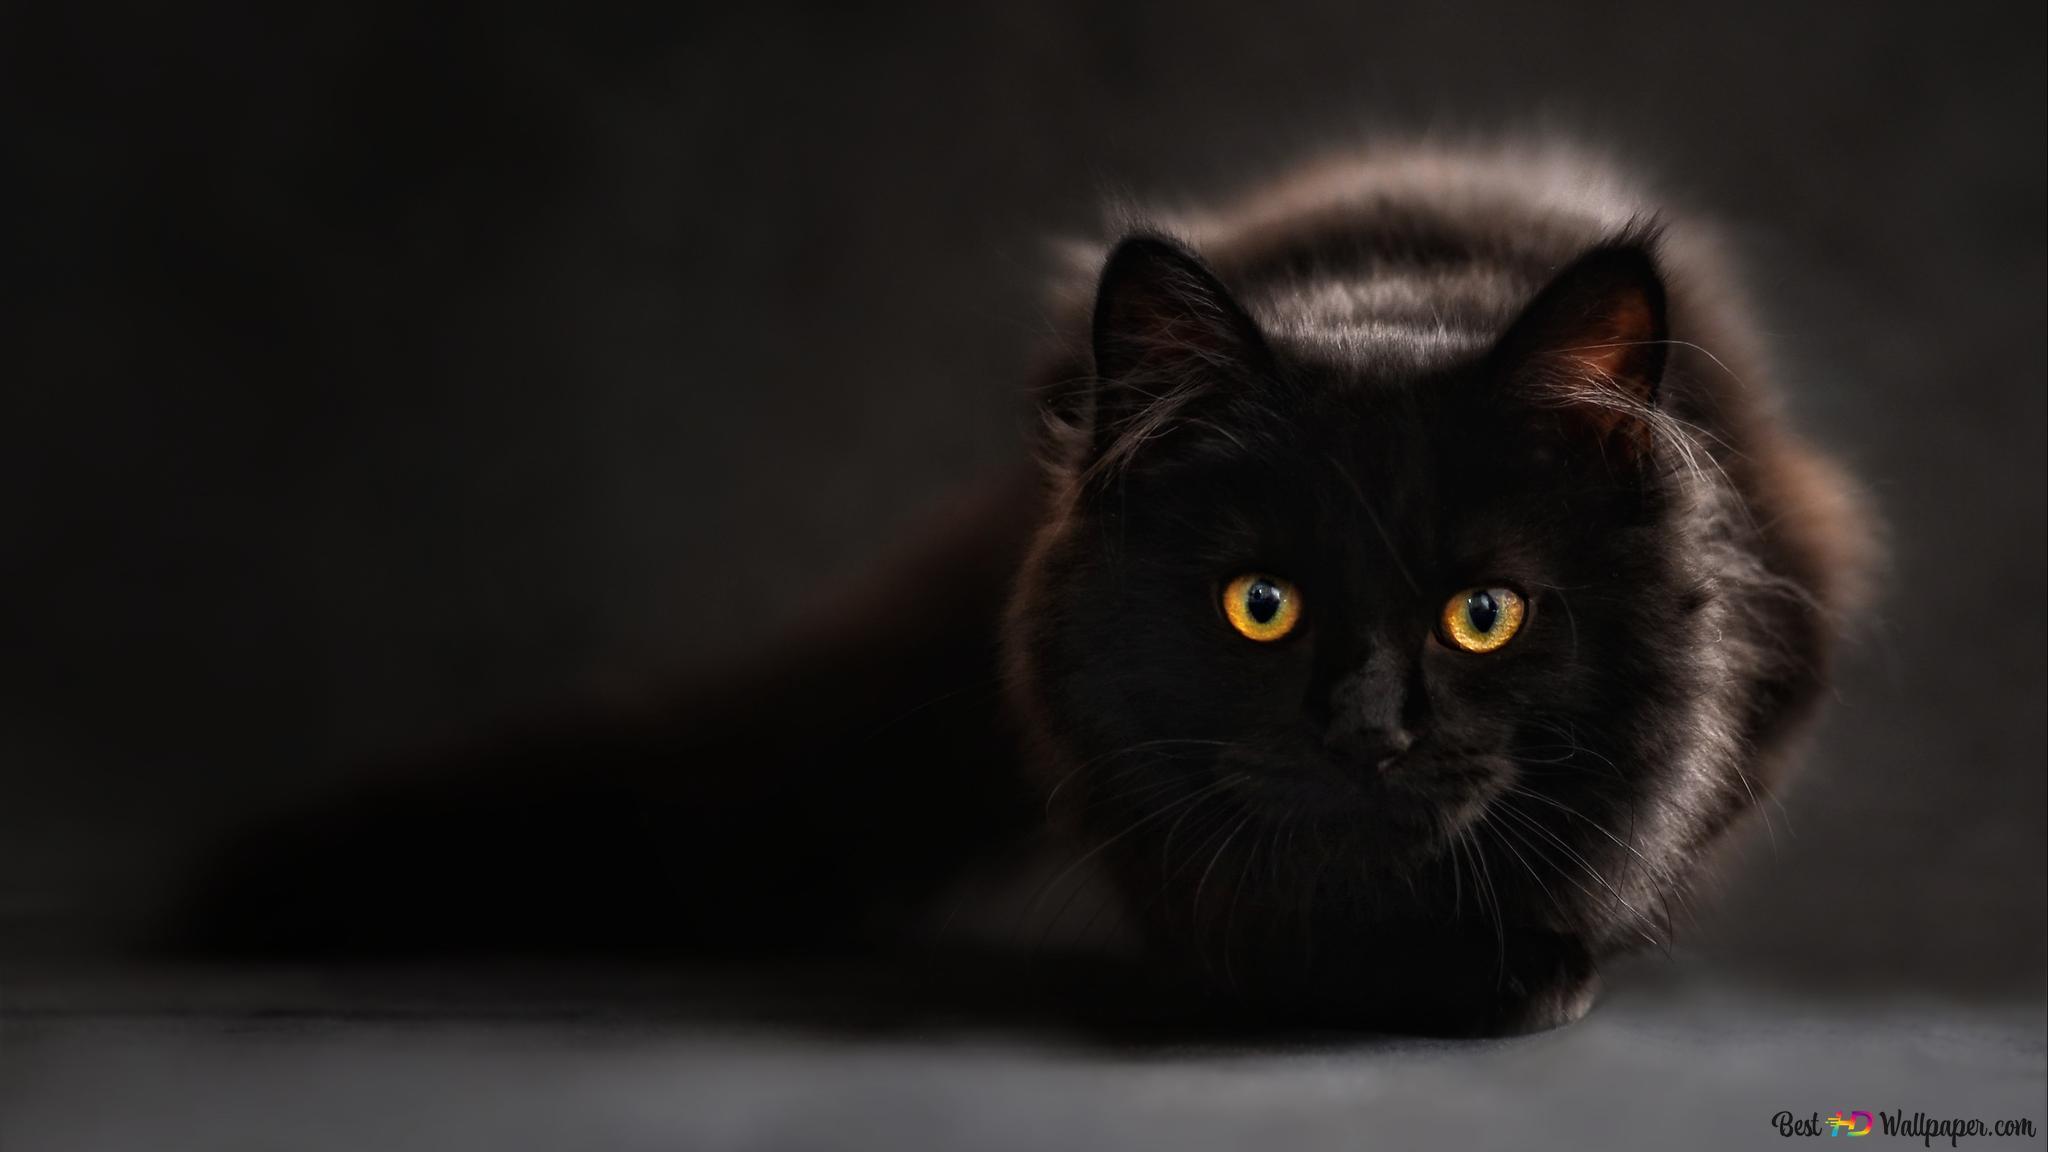 Cute Black Cat Hd Wallpaper Download